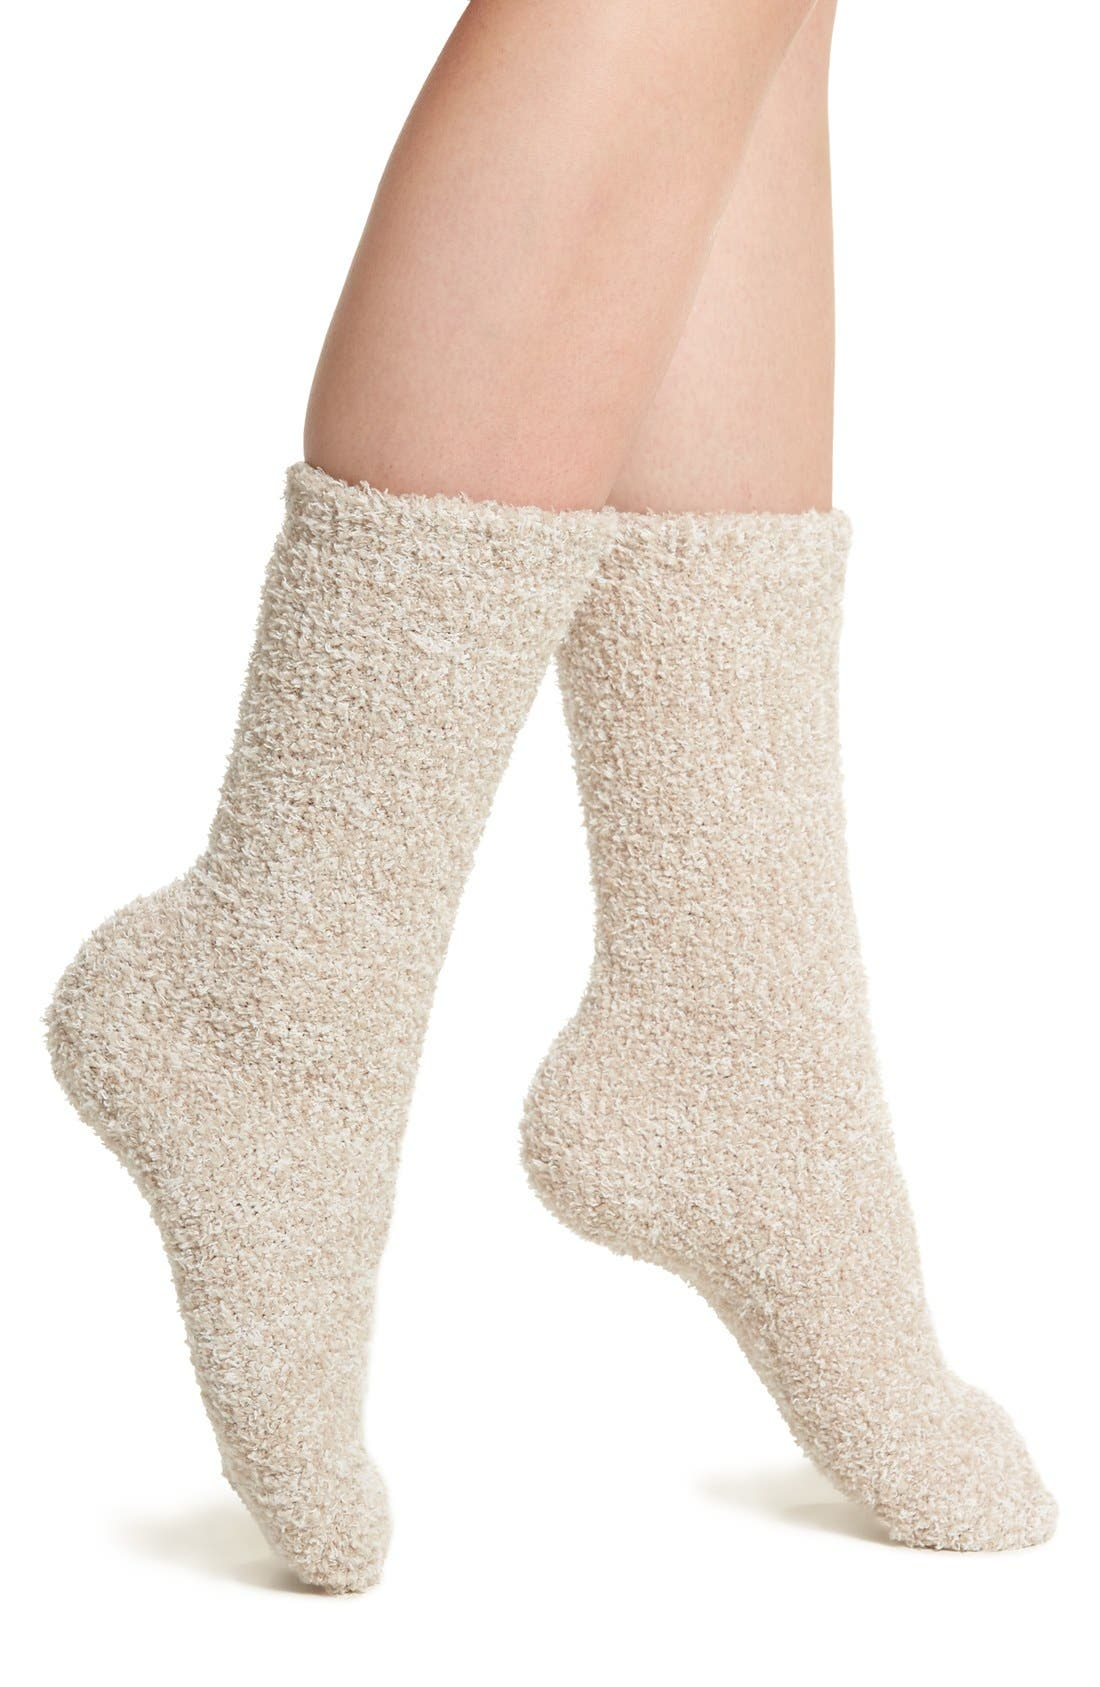 CozyChic<sup>®</sup> Socks,                             Main thumbnail 1, color,                             STONE/ WHITE